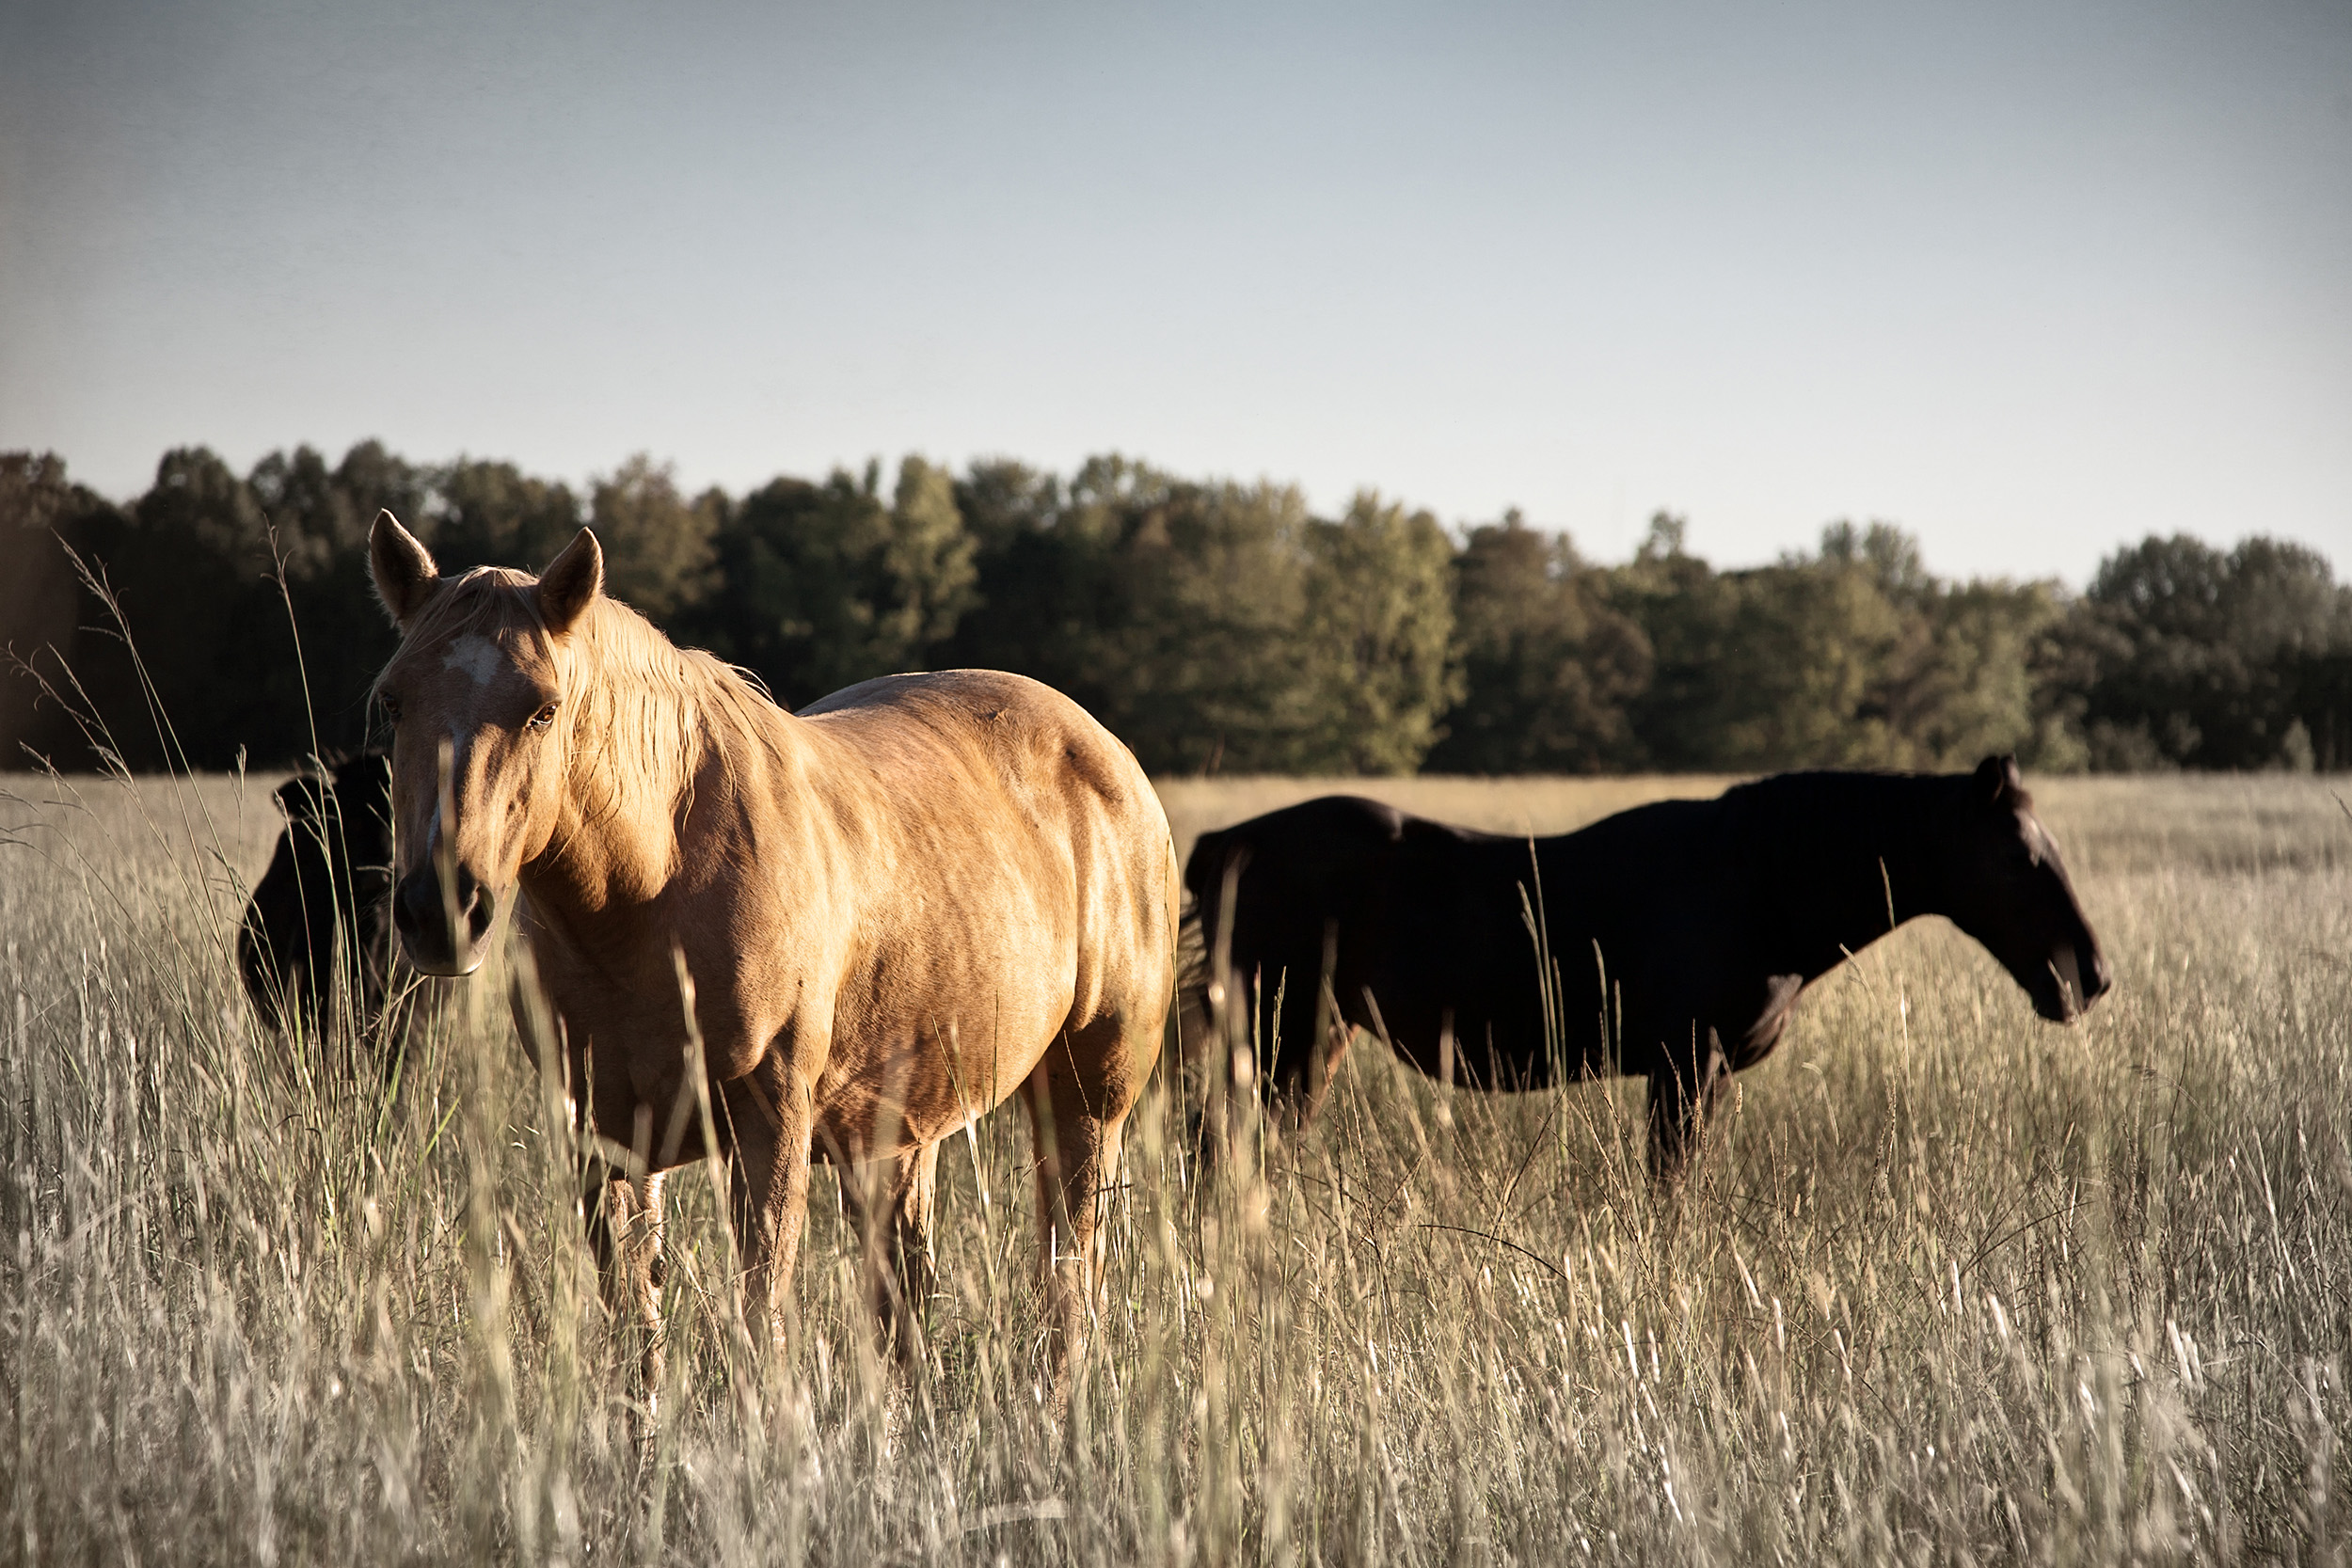 RSmith_HorsesField-1278v3_2500.jpg